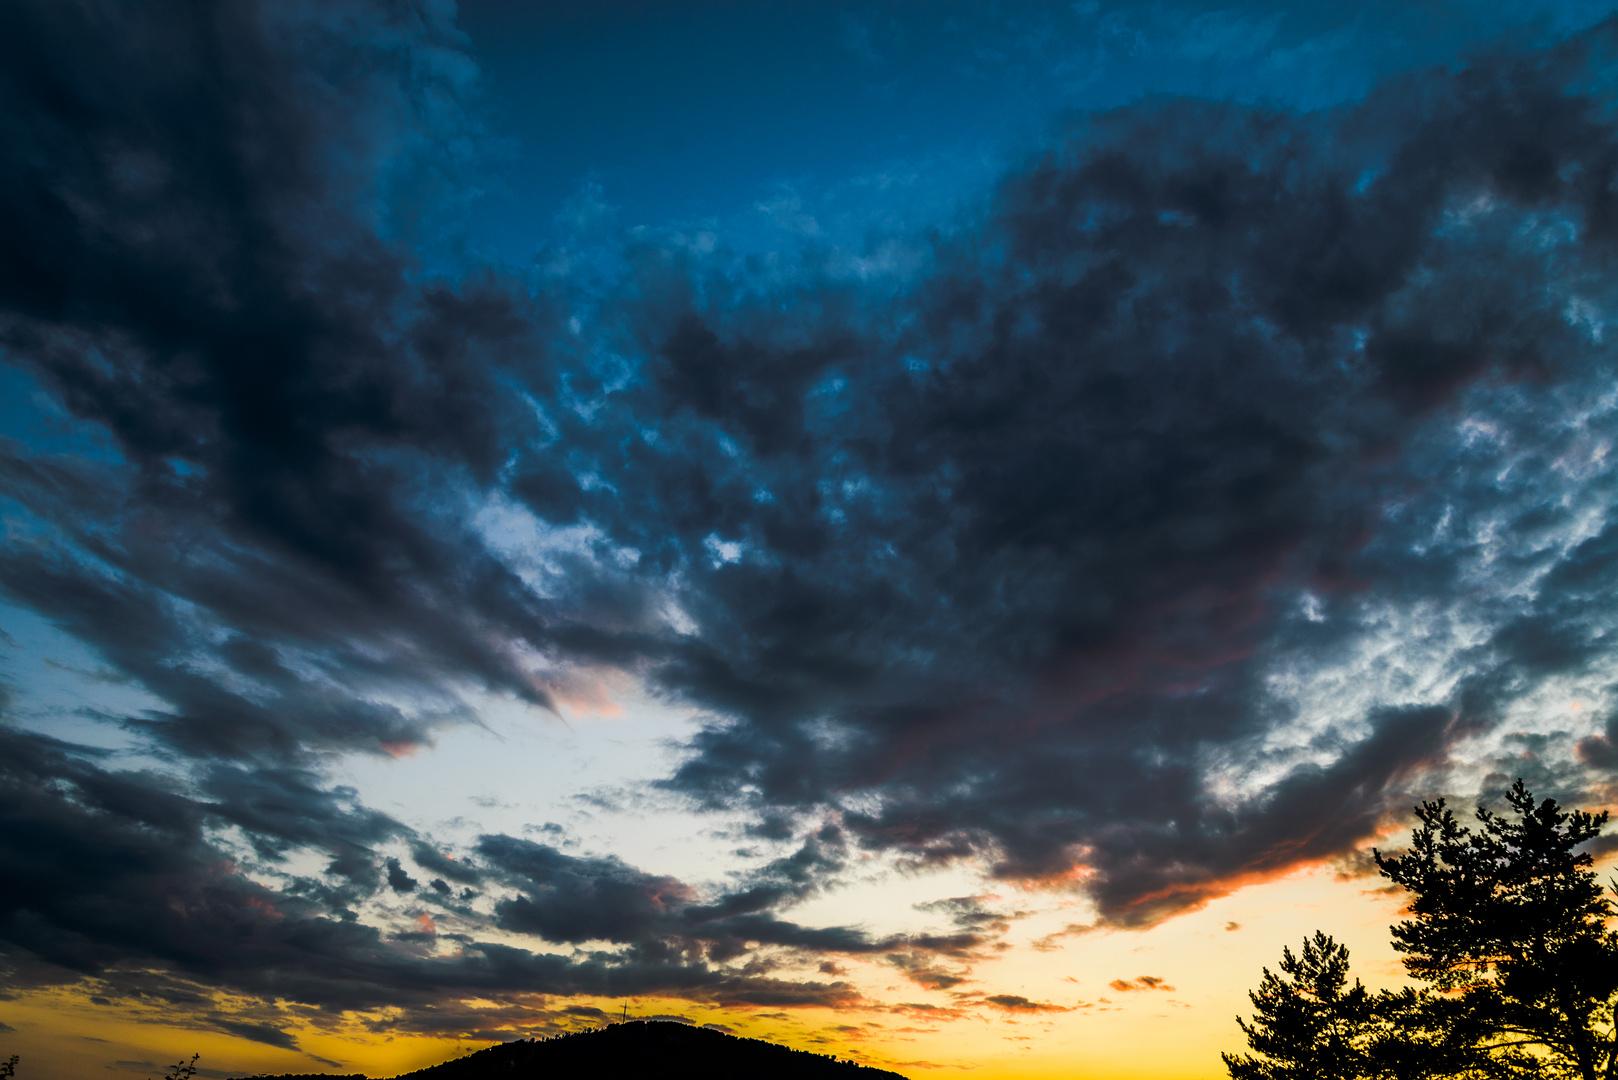 Wolkenloch bei Sonnenuntergang